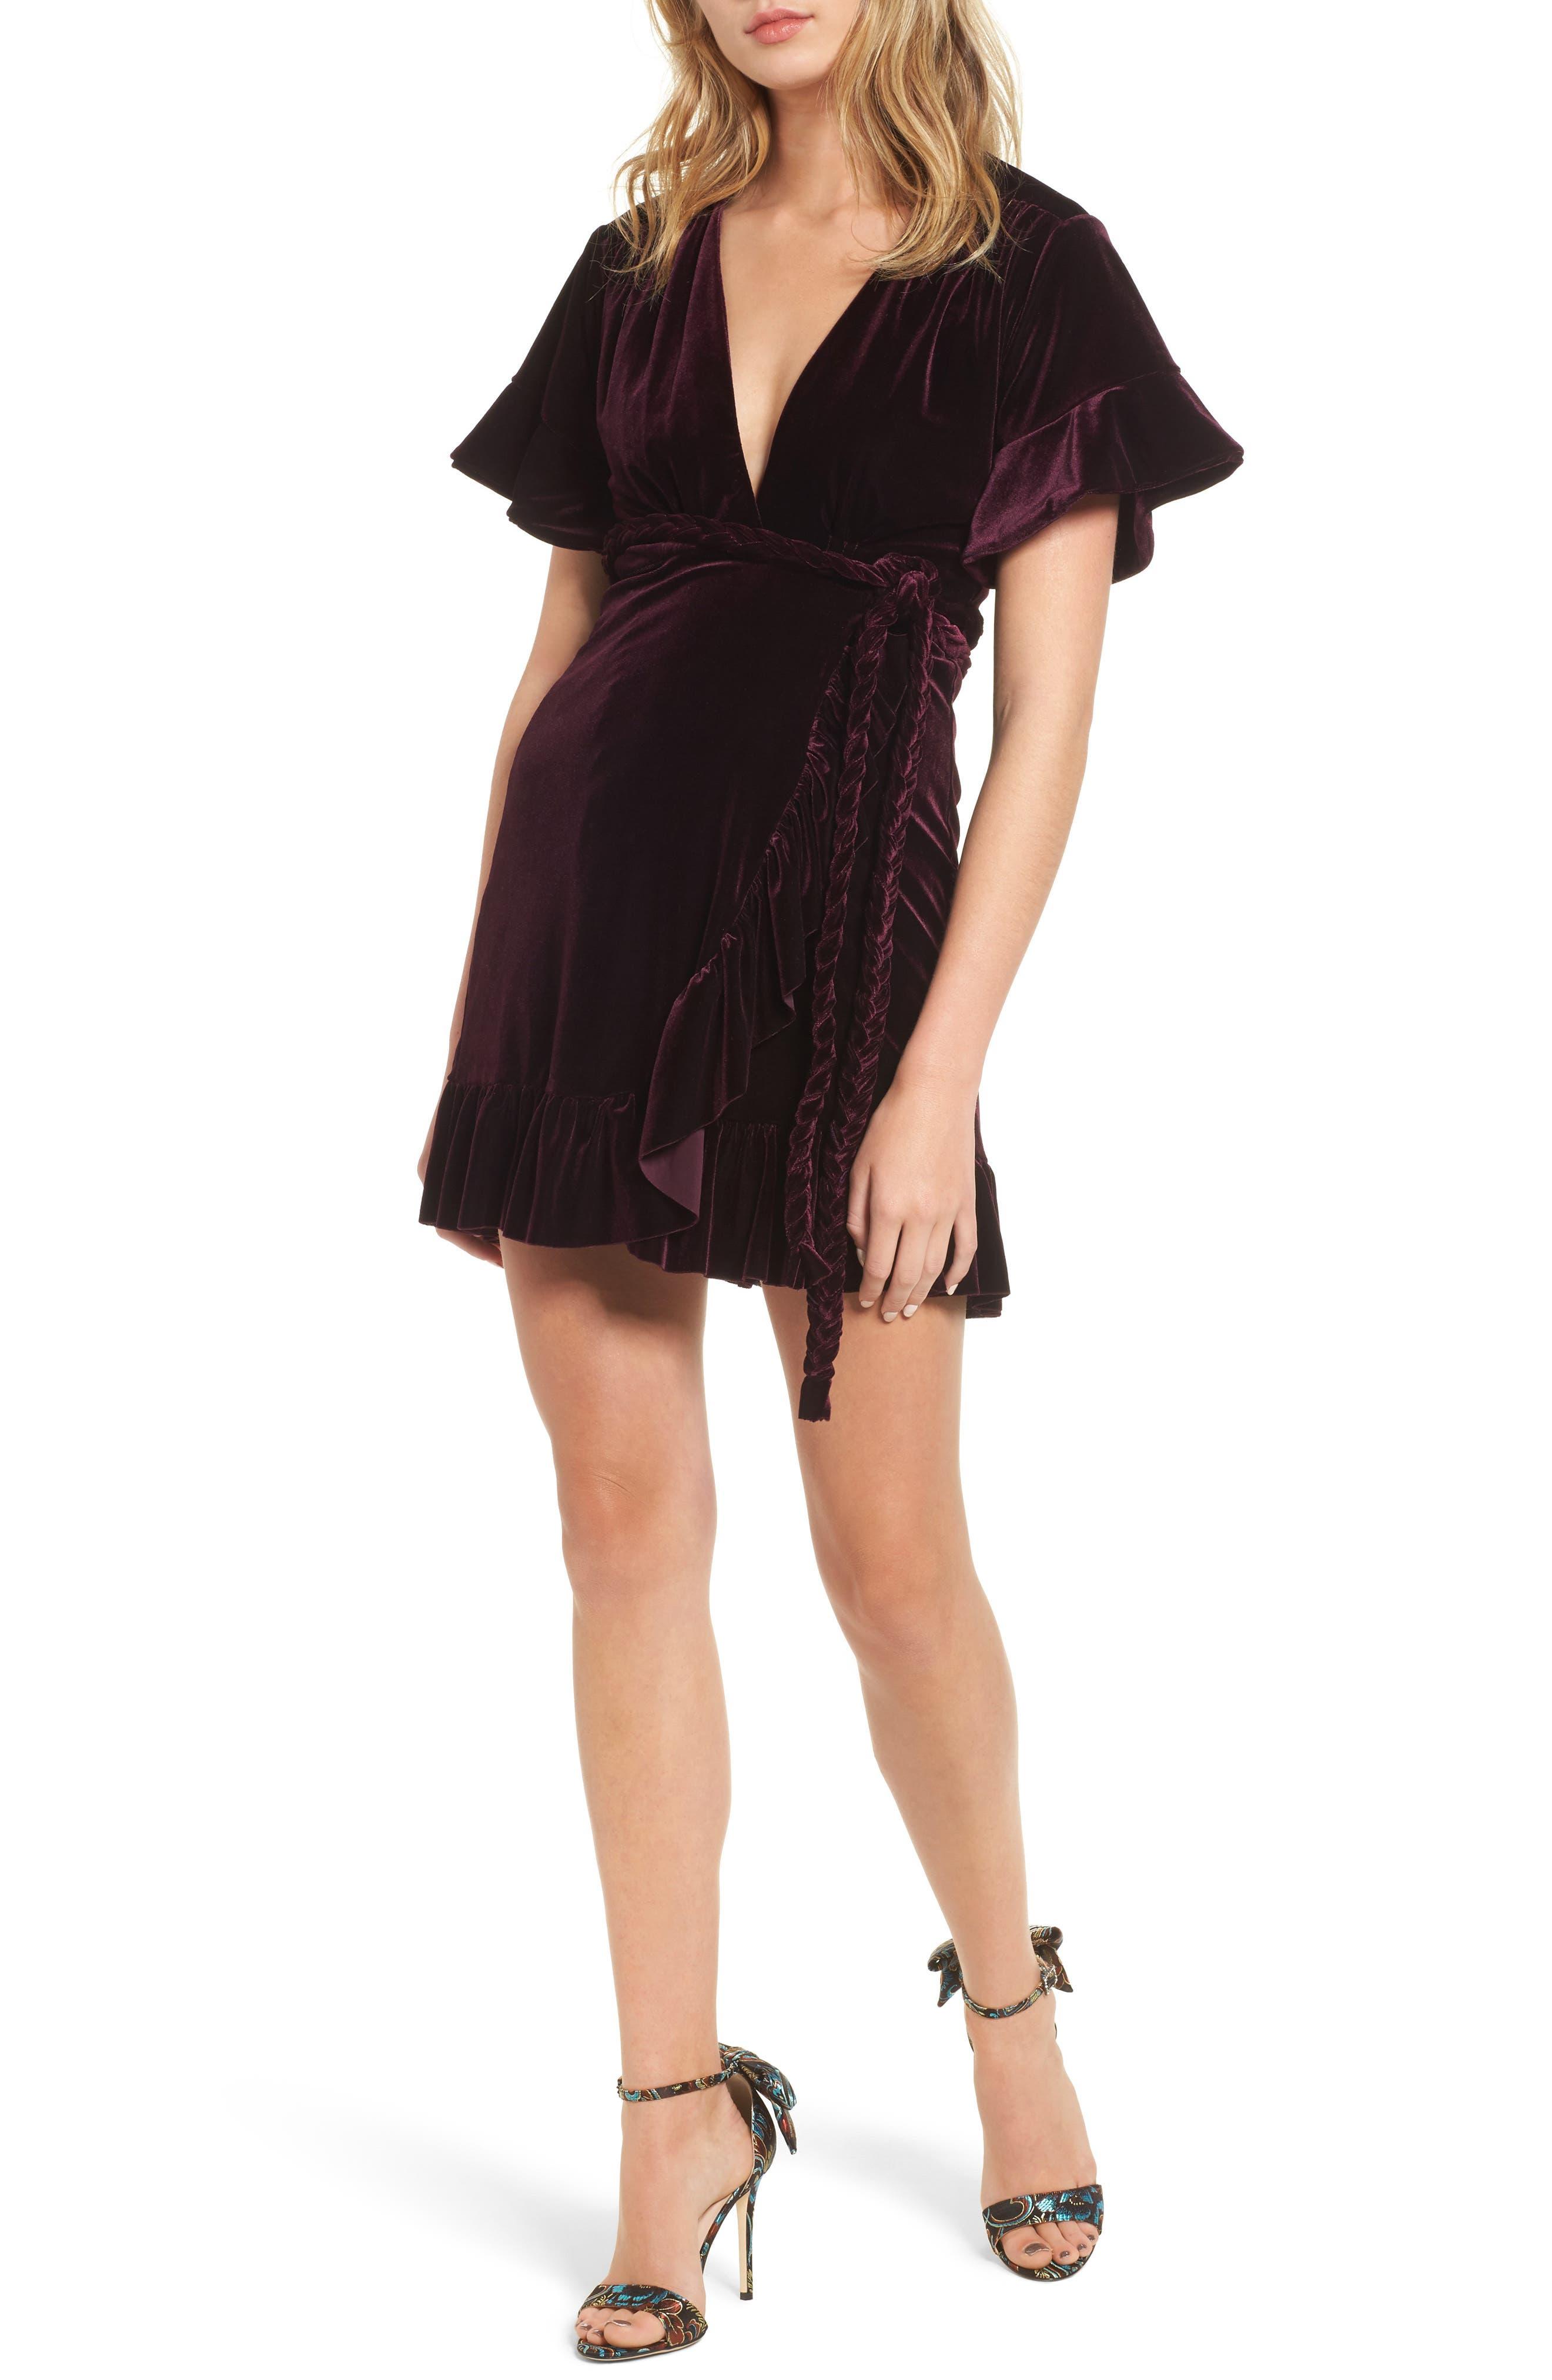 Desma Velvet Wrap Dress,                             Main thumbnail 1, color,                             505